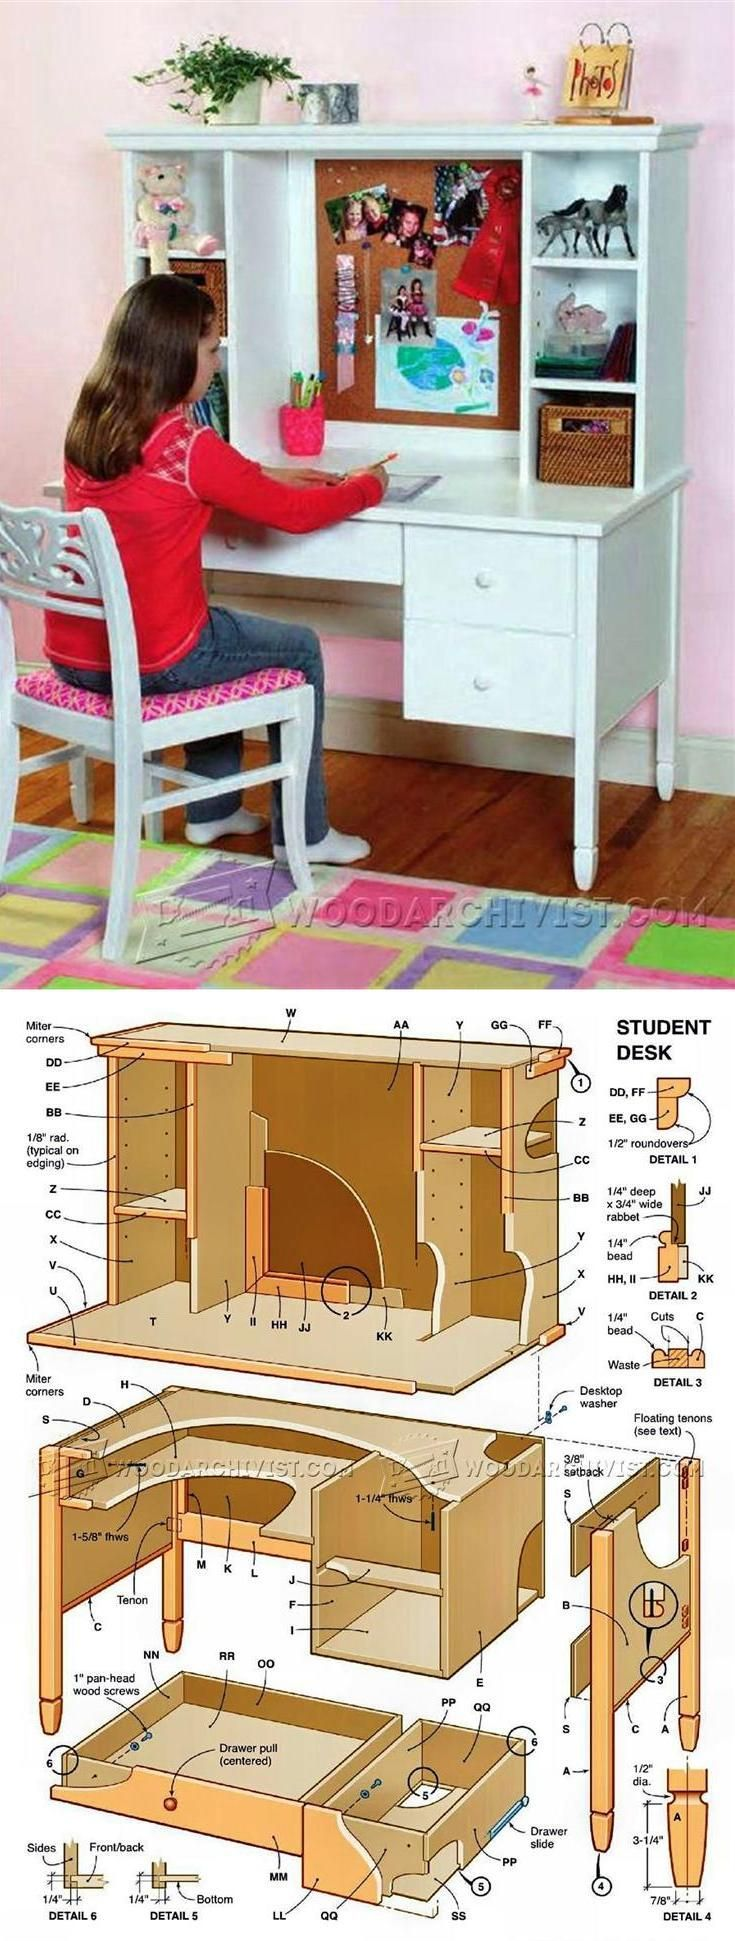 Design Homemade Dining Table Plans Diy Ideas 187 Woodplans Woodplans - Student desk plans children s furniture plans and projects woodarchivist com